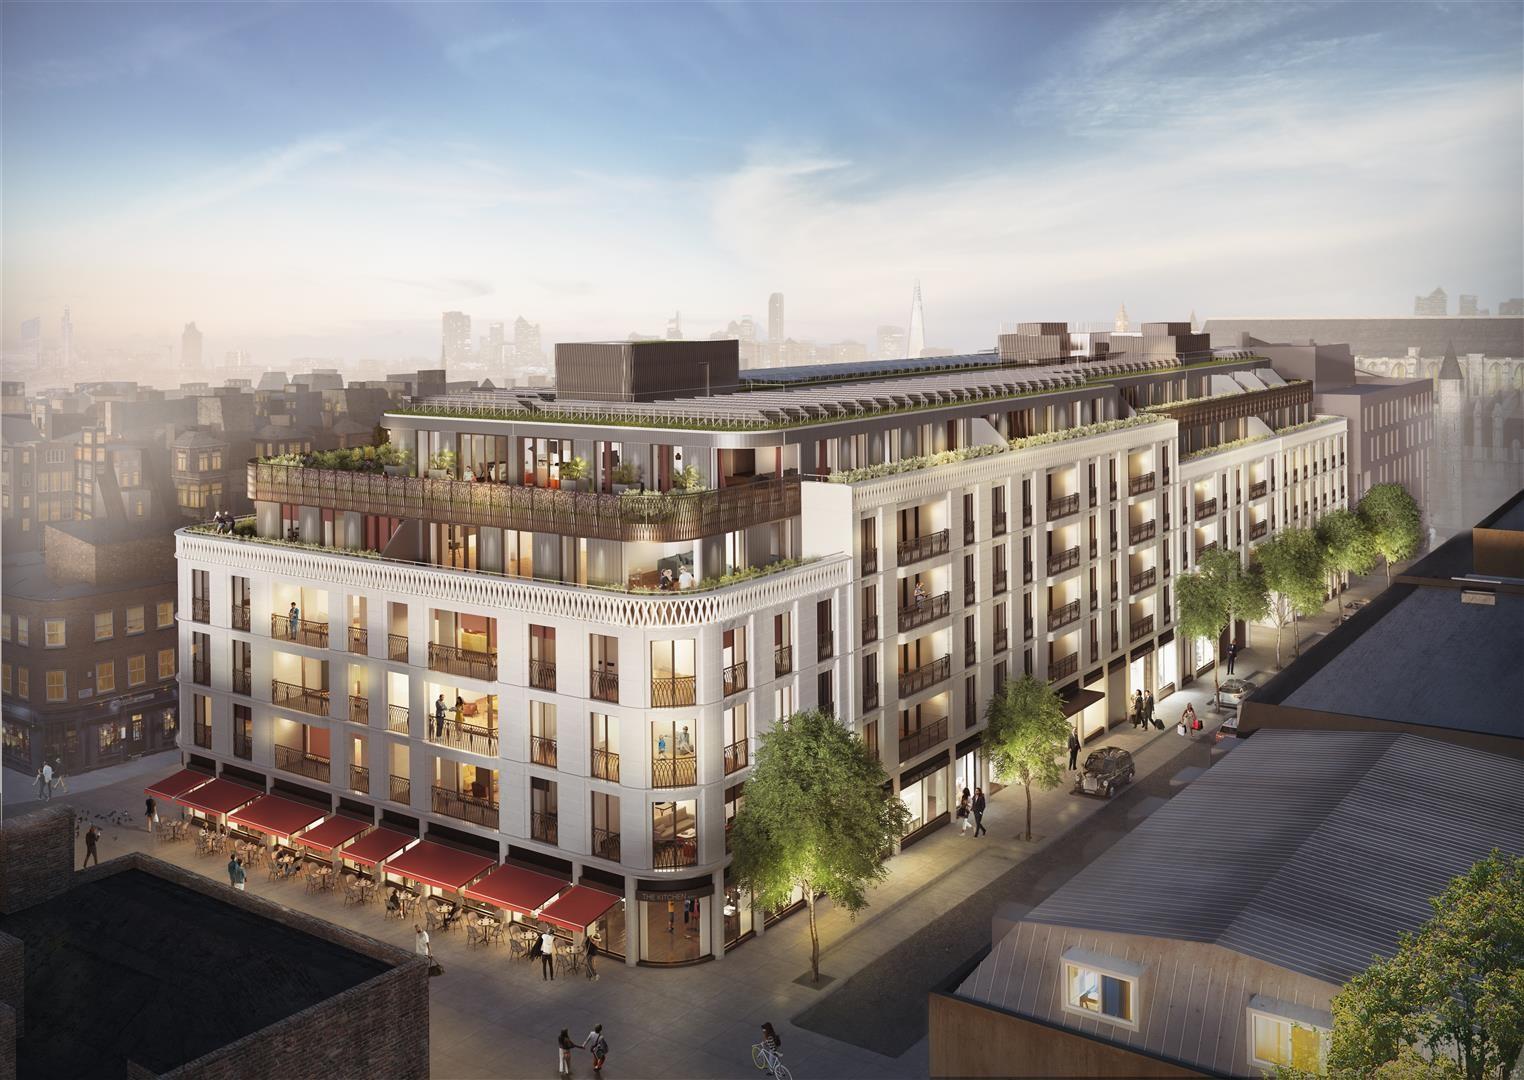 Marylebone luxury city London apartment development